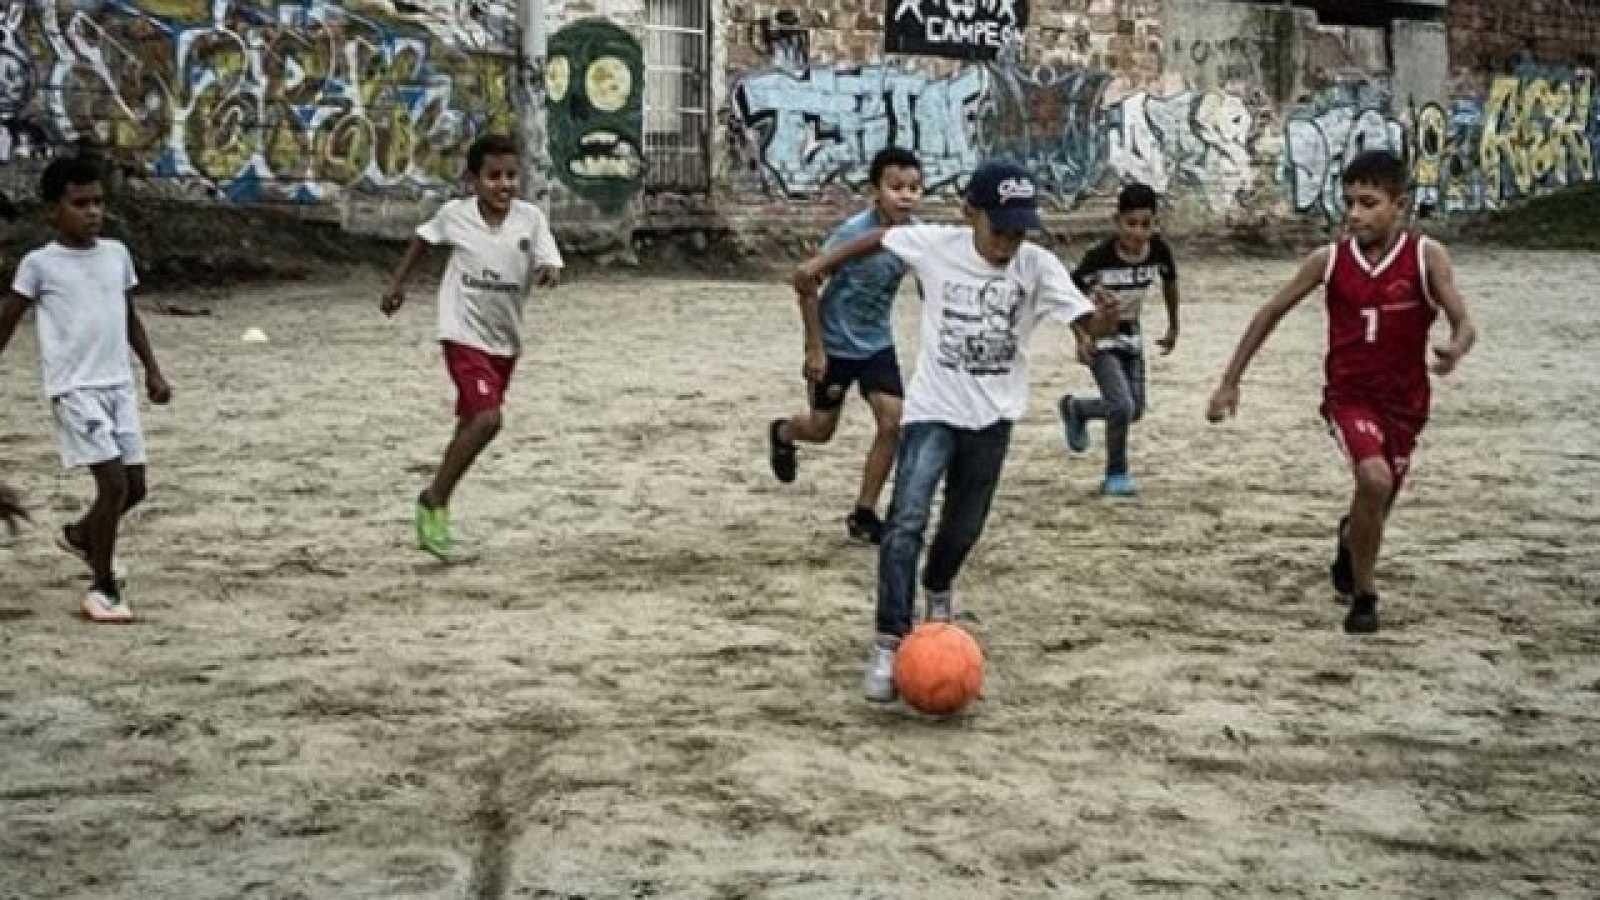 Hora América - DOC FC. Documental de fútbol callejero - escuchar ahora